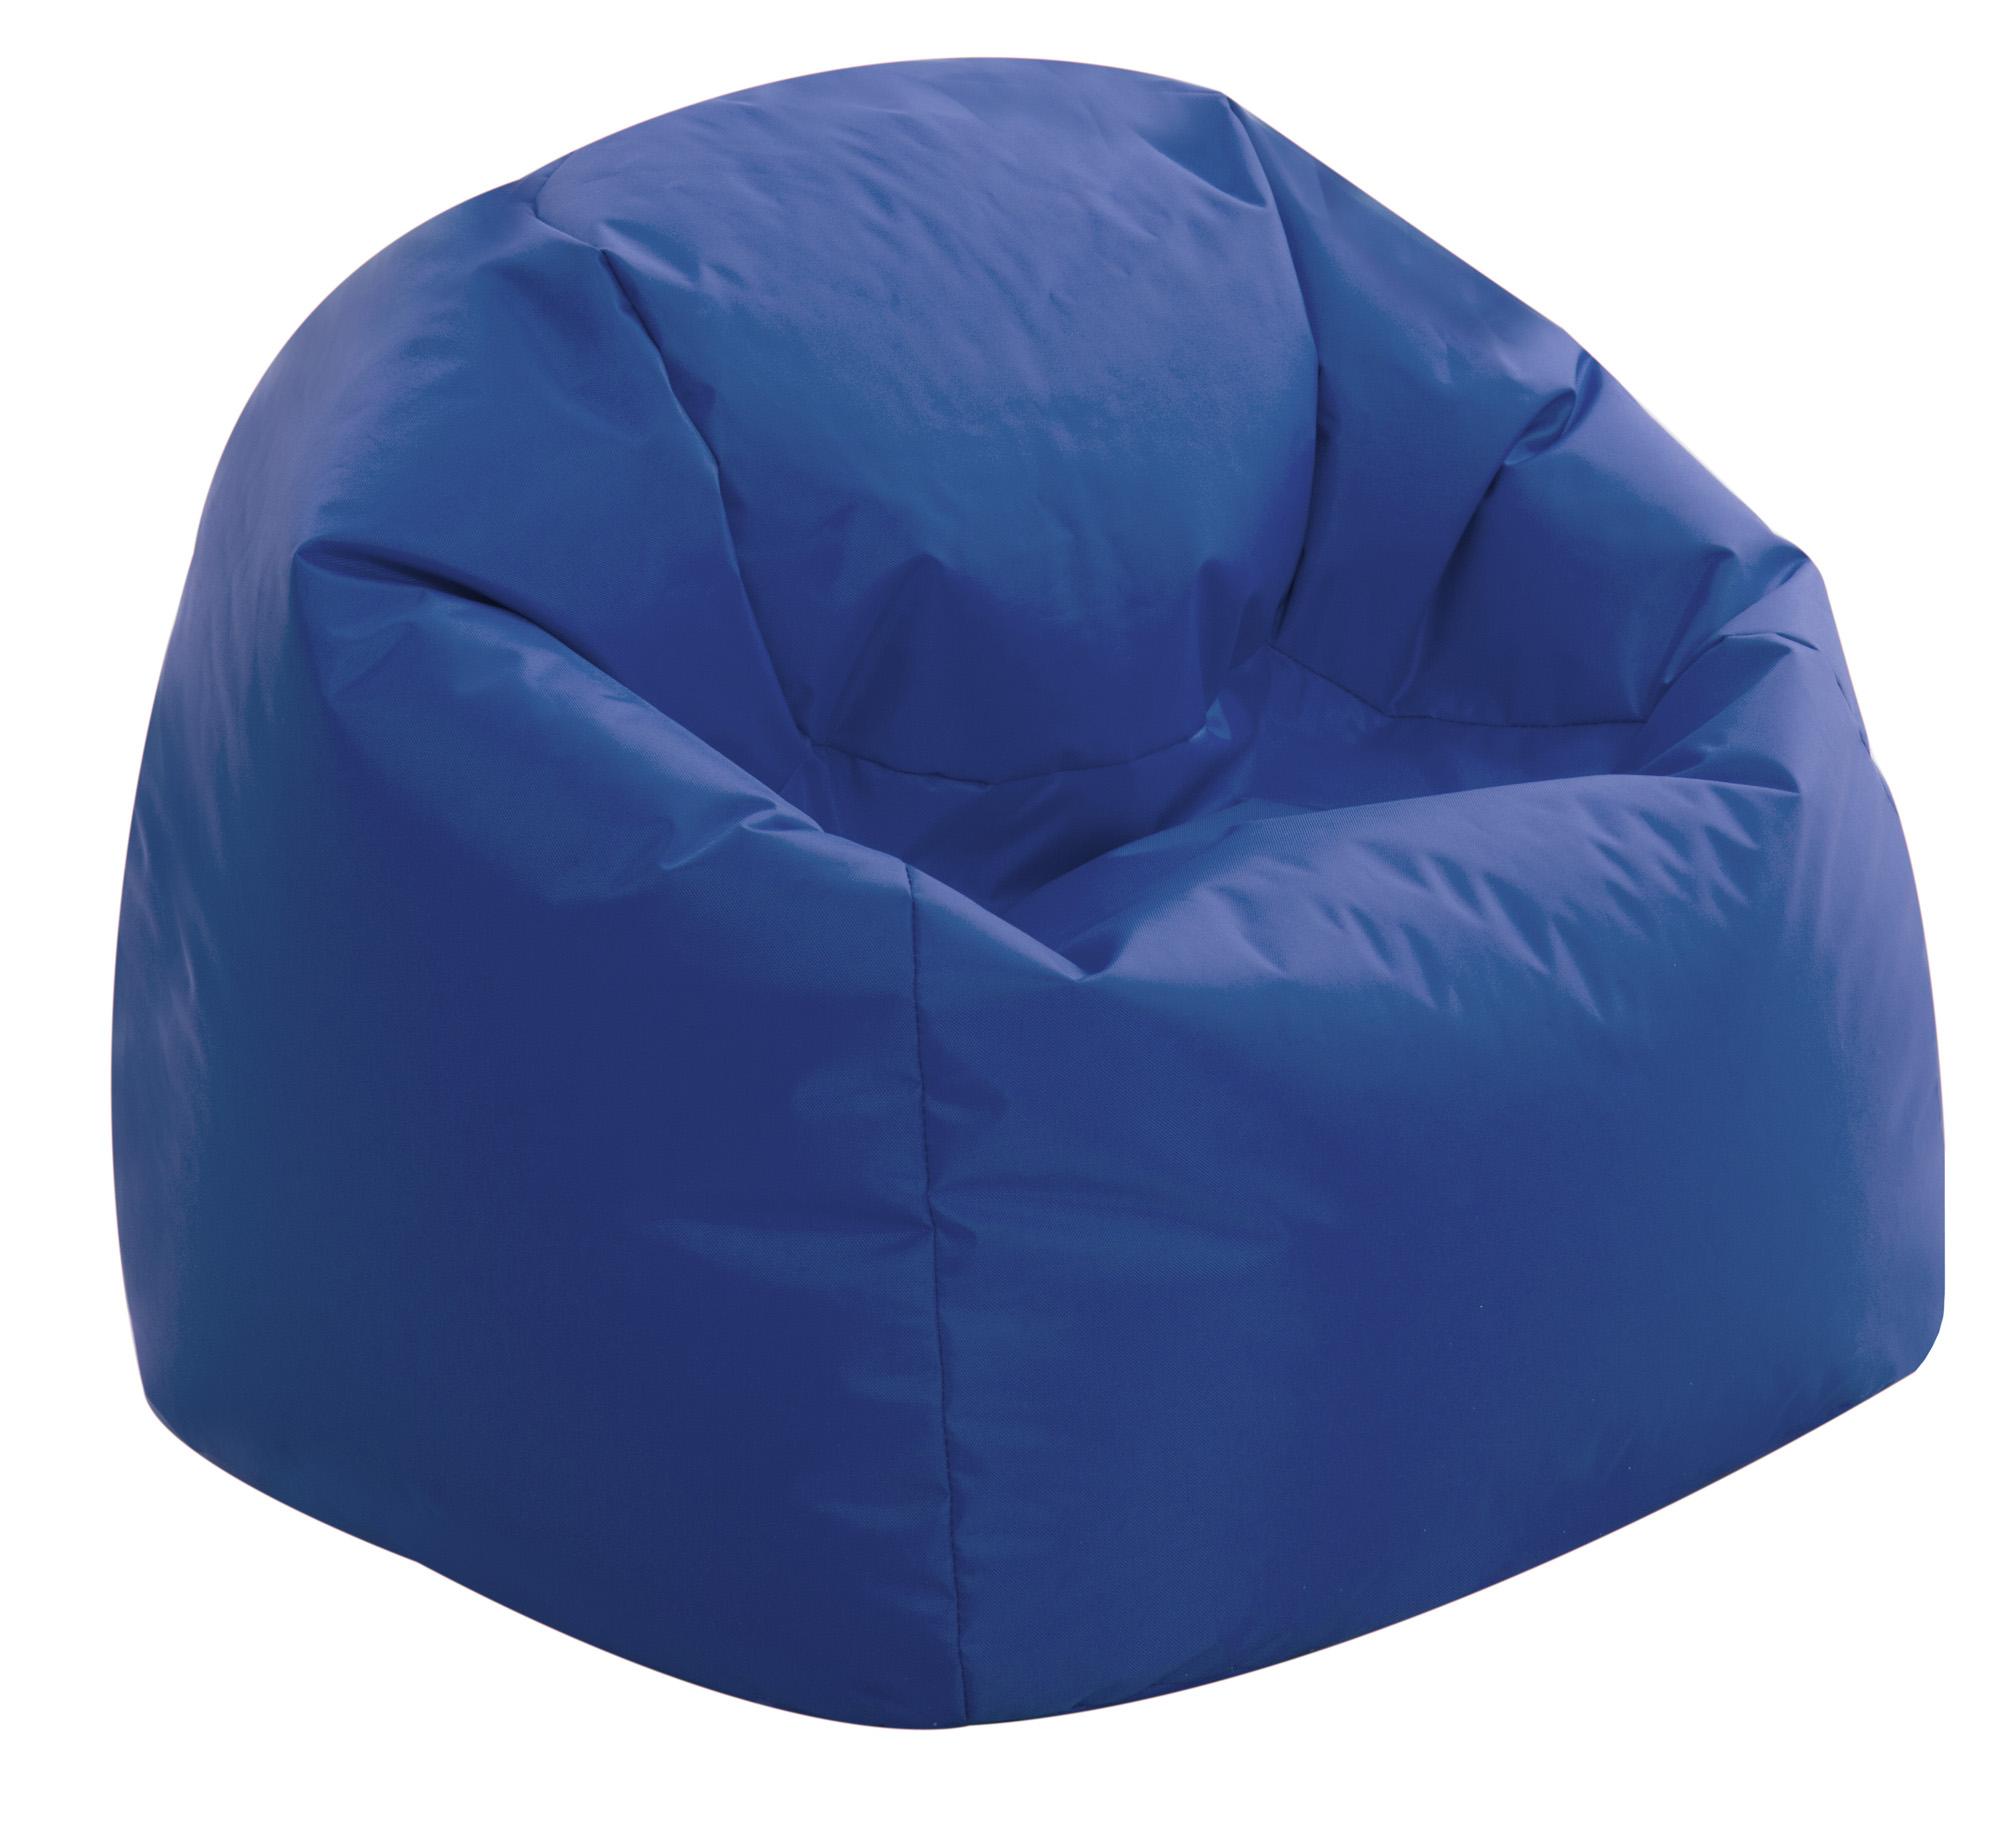 Eden-Primary-Bean-Bag-Blue-300dpi-1